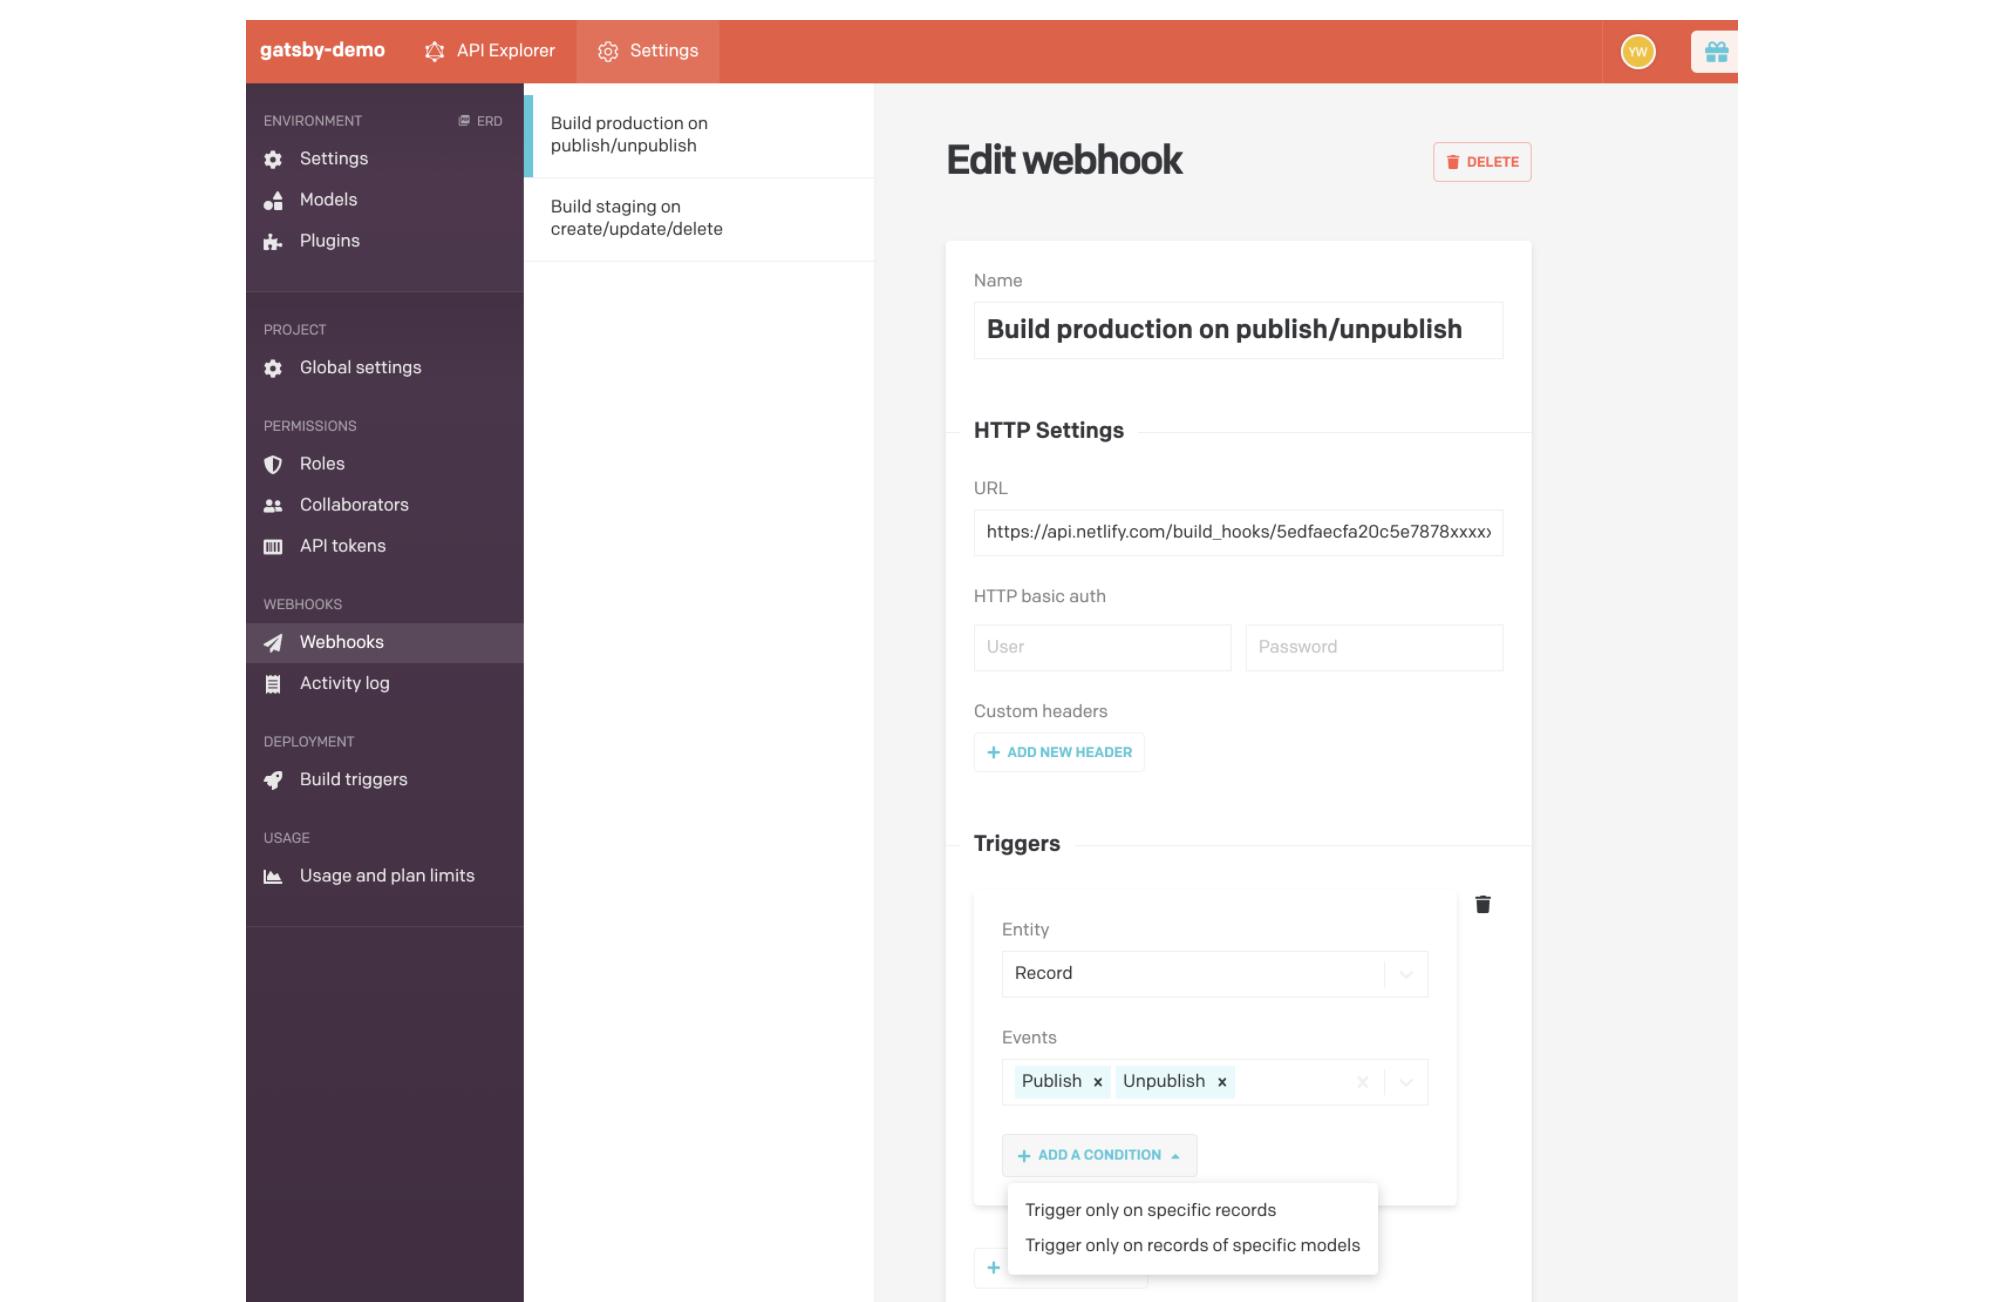 Editing DatoCMS Webhook